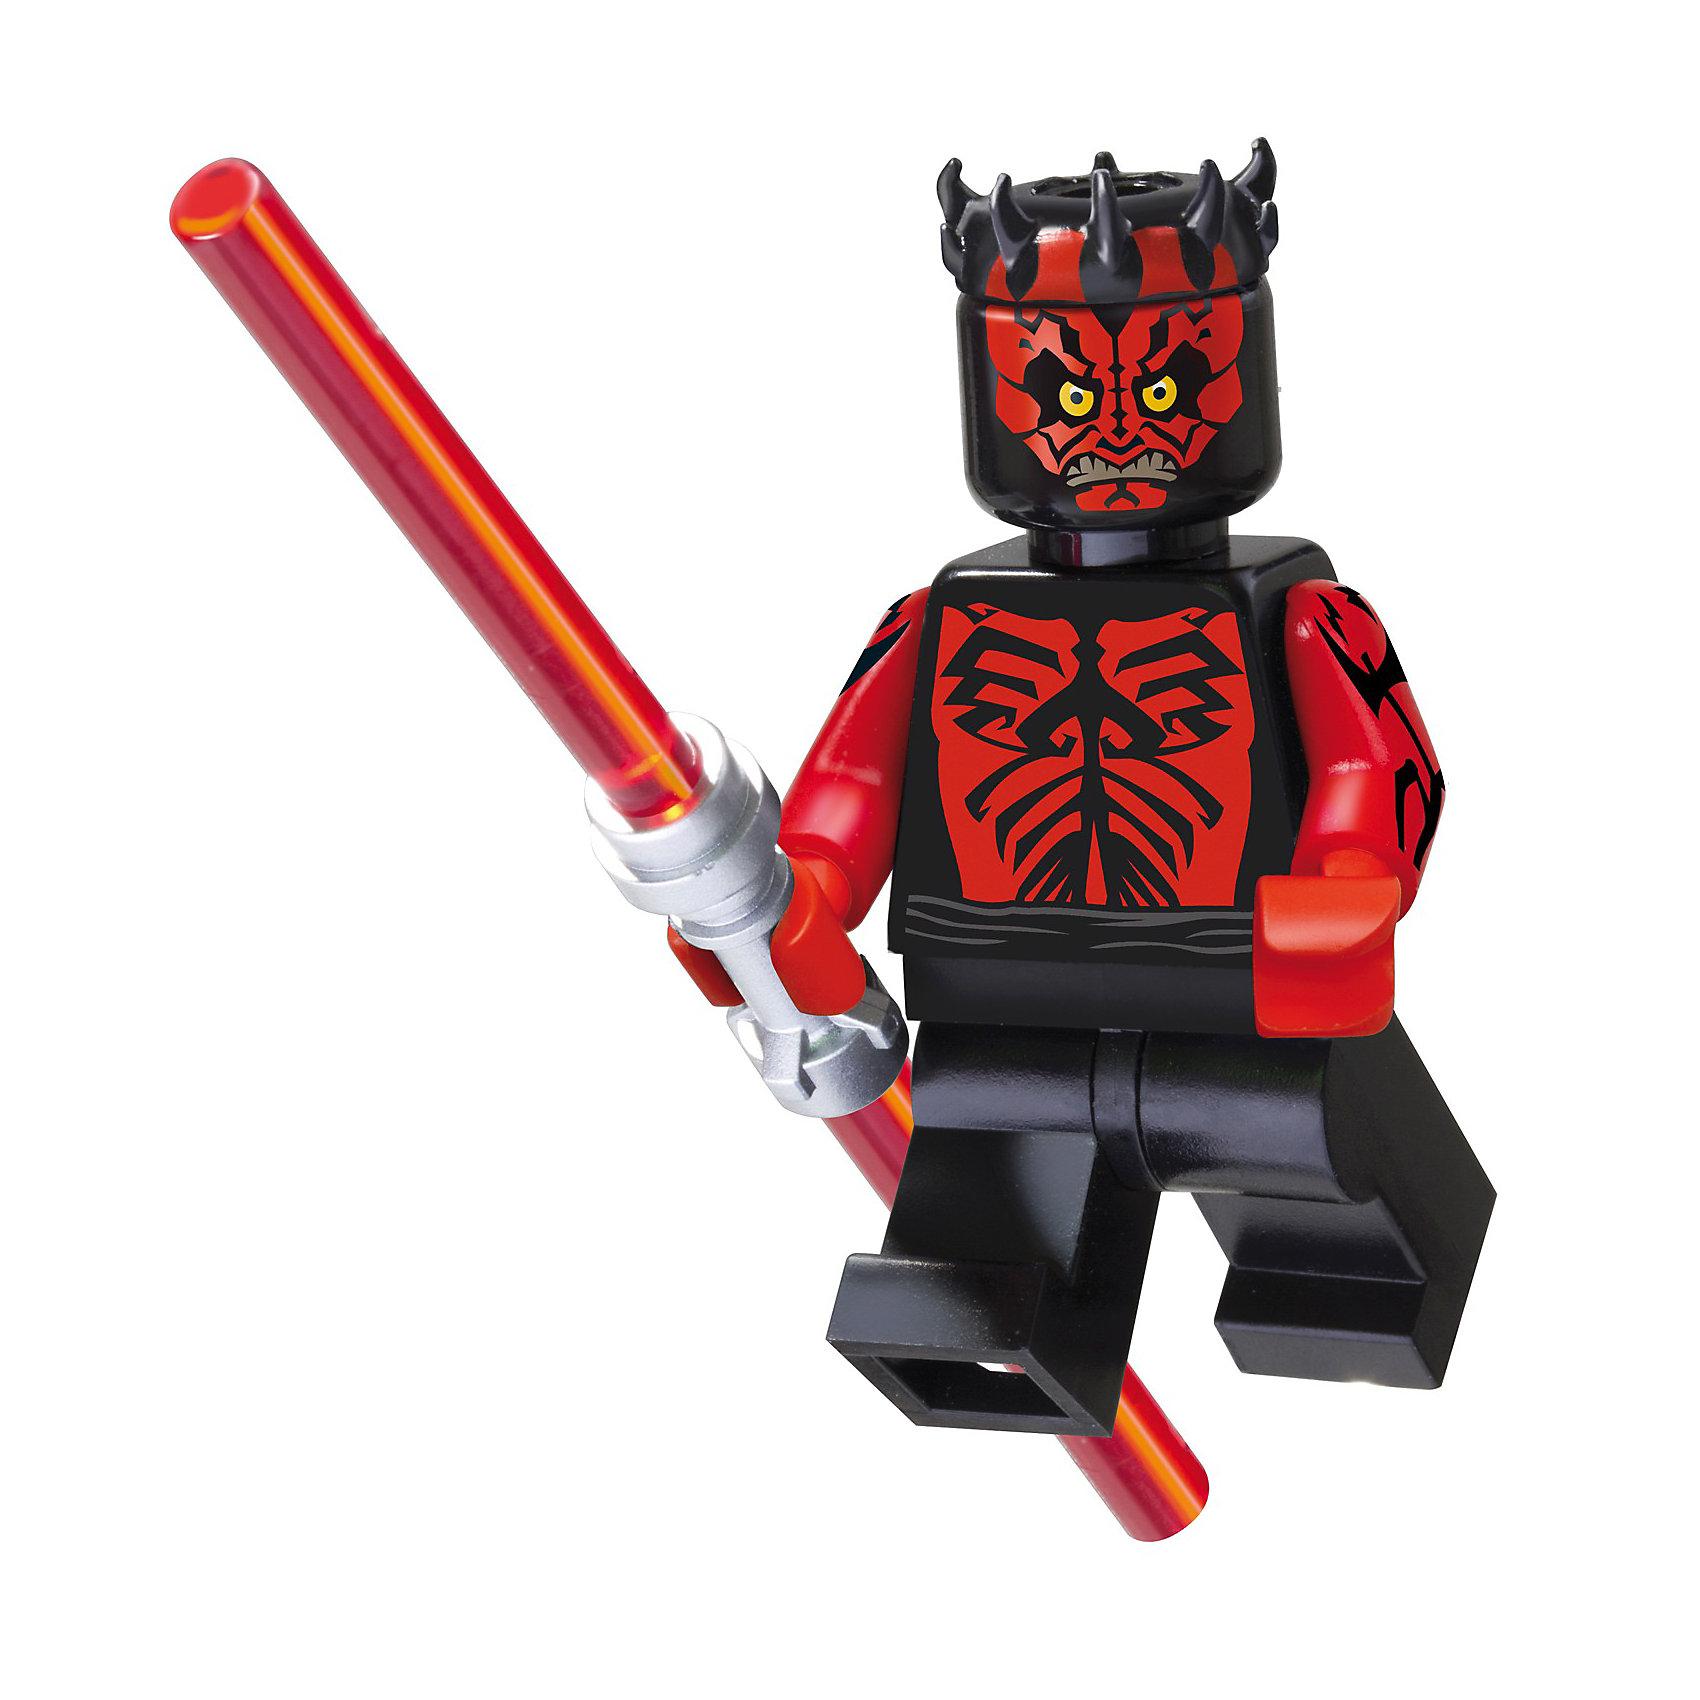 LEGO Star Wars Подарок минифигурка Дарта МолаПластмассовые конструкторы<br>star wars pdtplyst djbys djqys звезные войны воины стар ворсыефк цфкы<br><br>Ширина мм: 120<br>Глубина мм: 90<br>Высота мм: 90<br>Вес г: 10<br>Возраст от месяцев: 72<br>Возраст до месяцев: 1188<br>Пол: Мужской<br>Возраст: Детский<br>SKU: 3055336